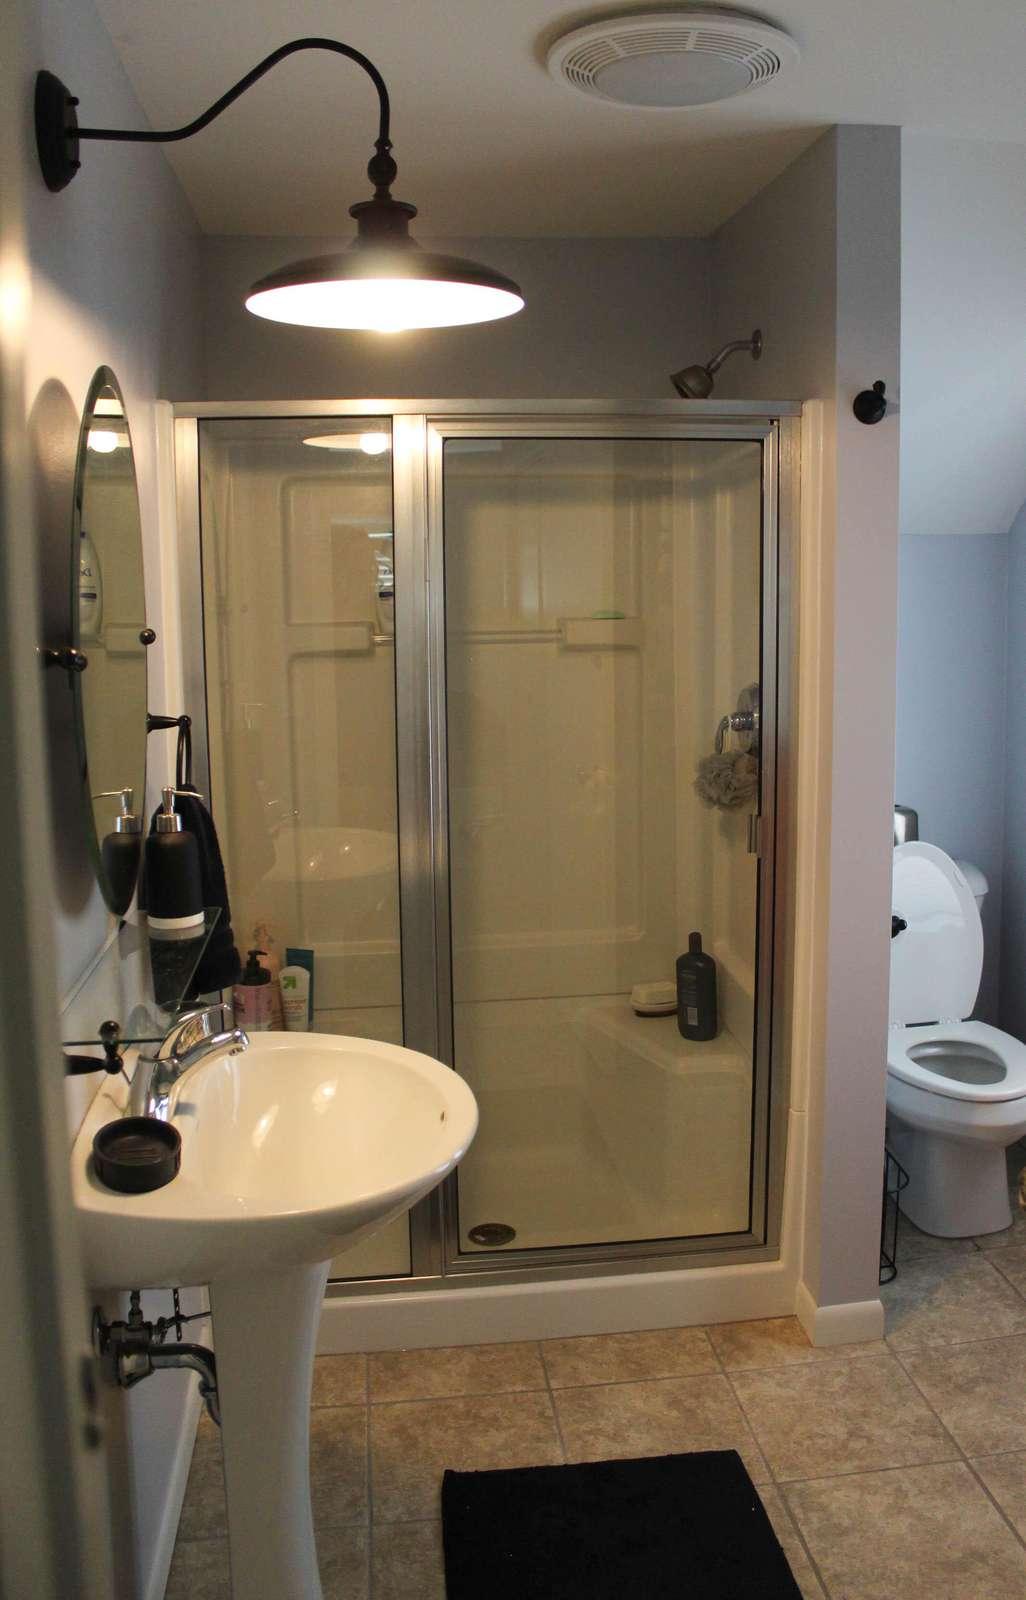 Upstair Bathroom